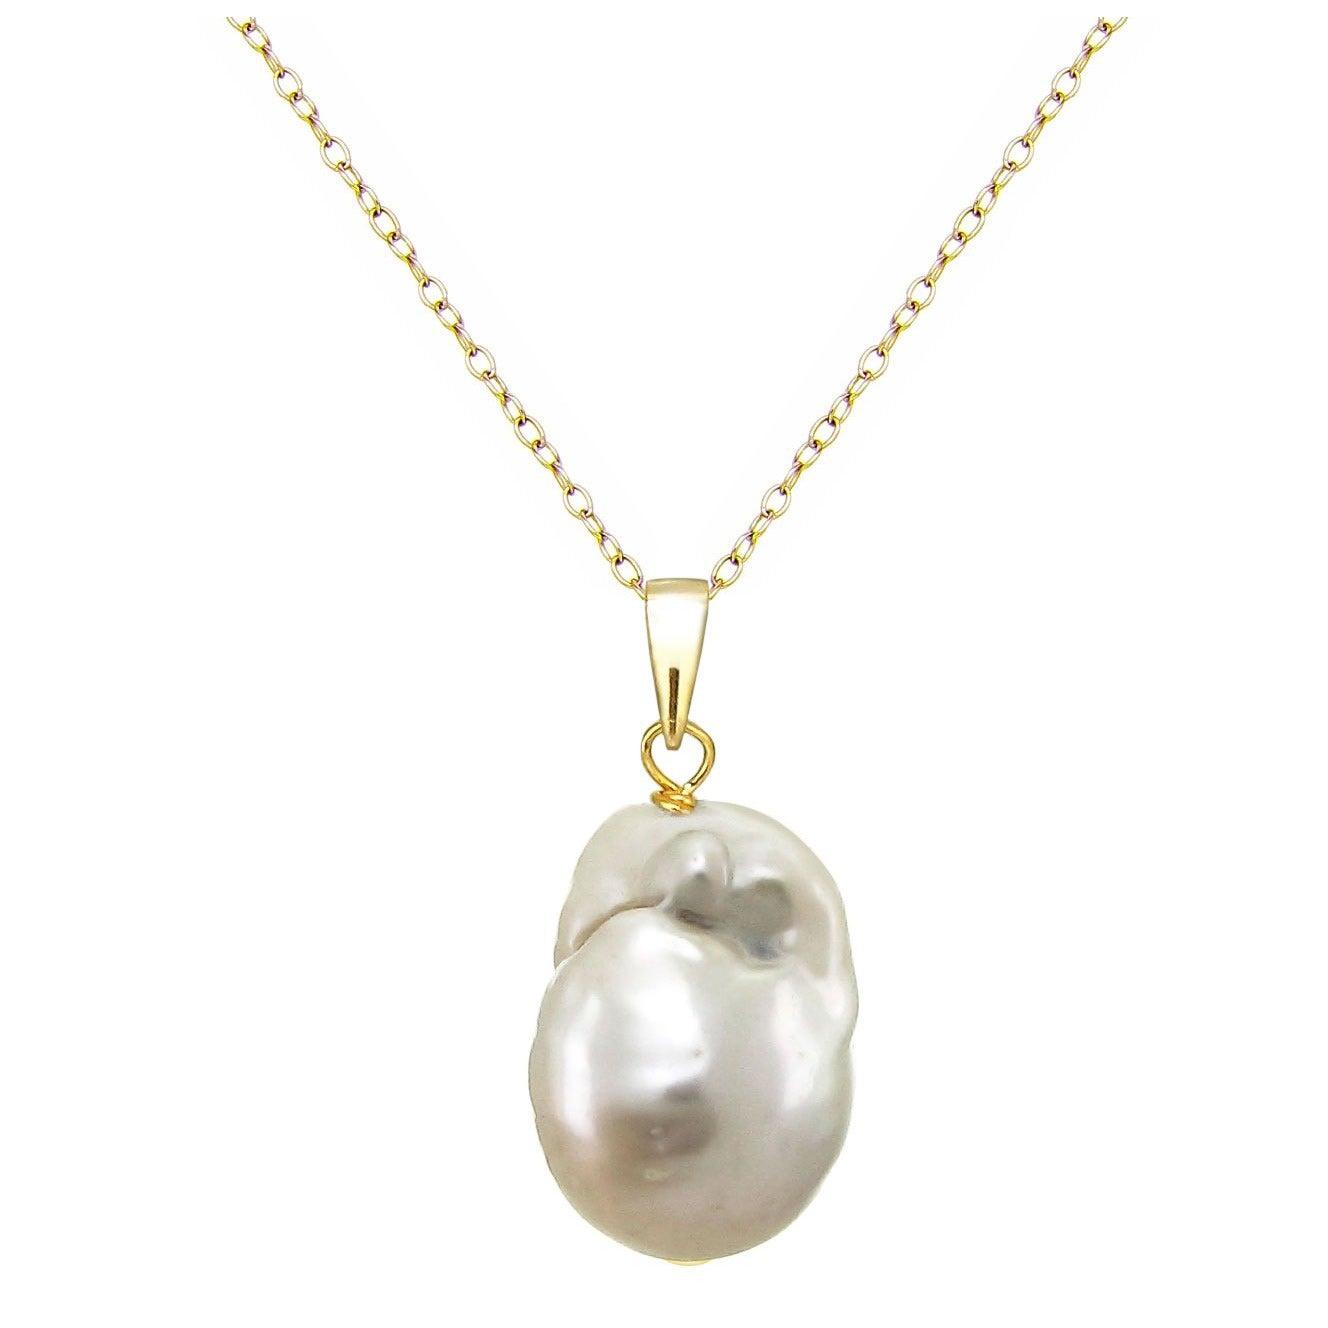 Frank Aaa+ 11-12mm Tahaitian Black Pearl Pendant Necklace 18 Inch Box